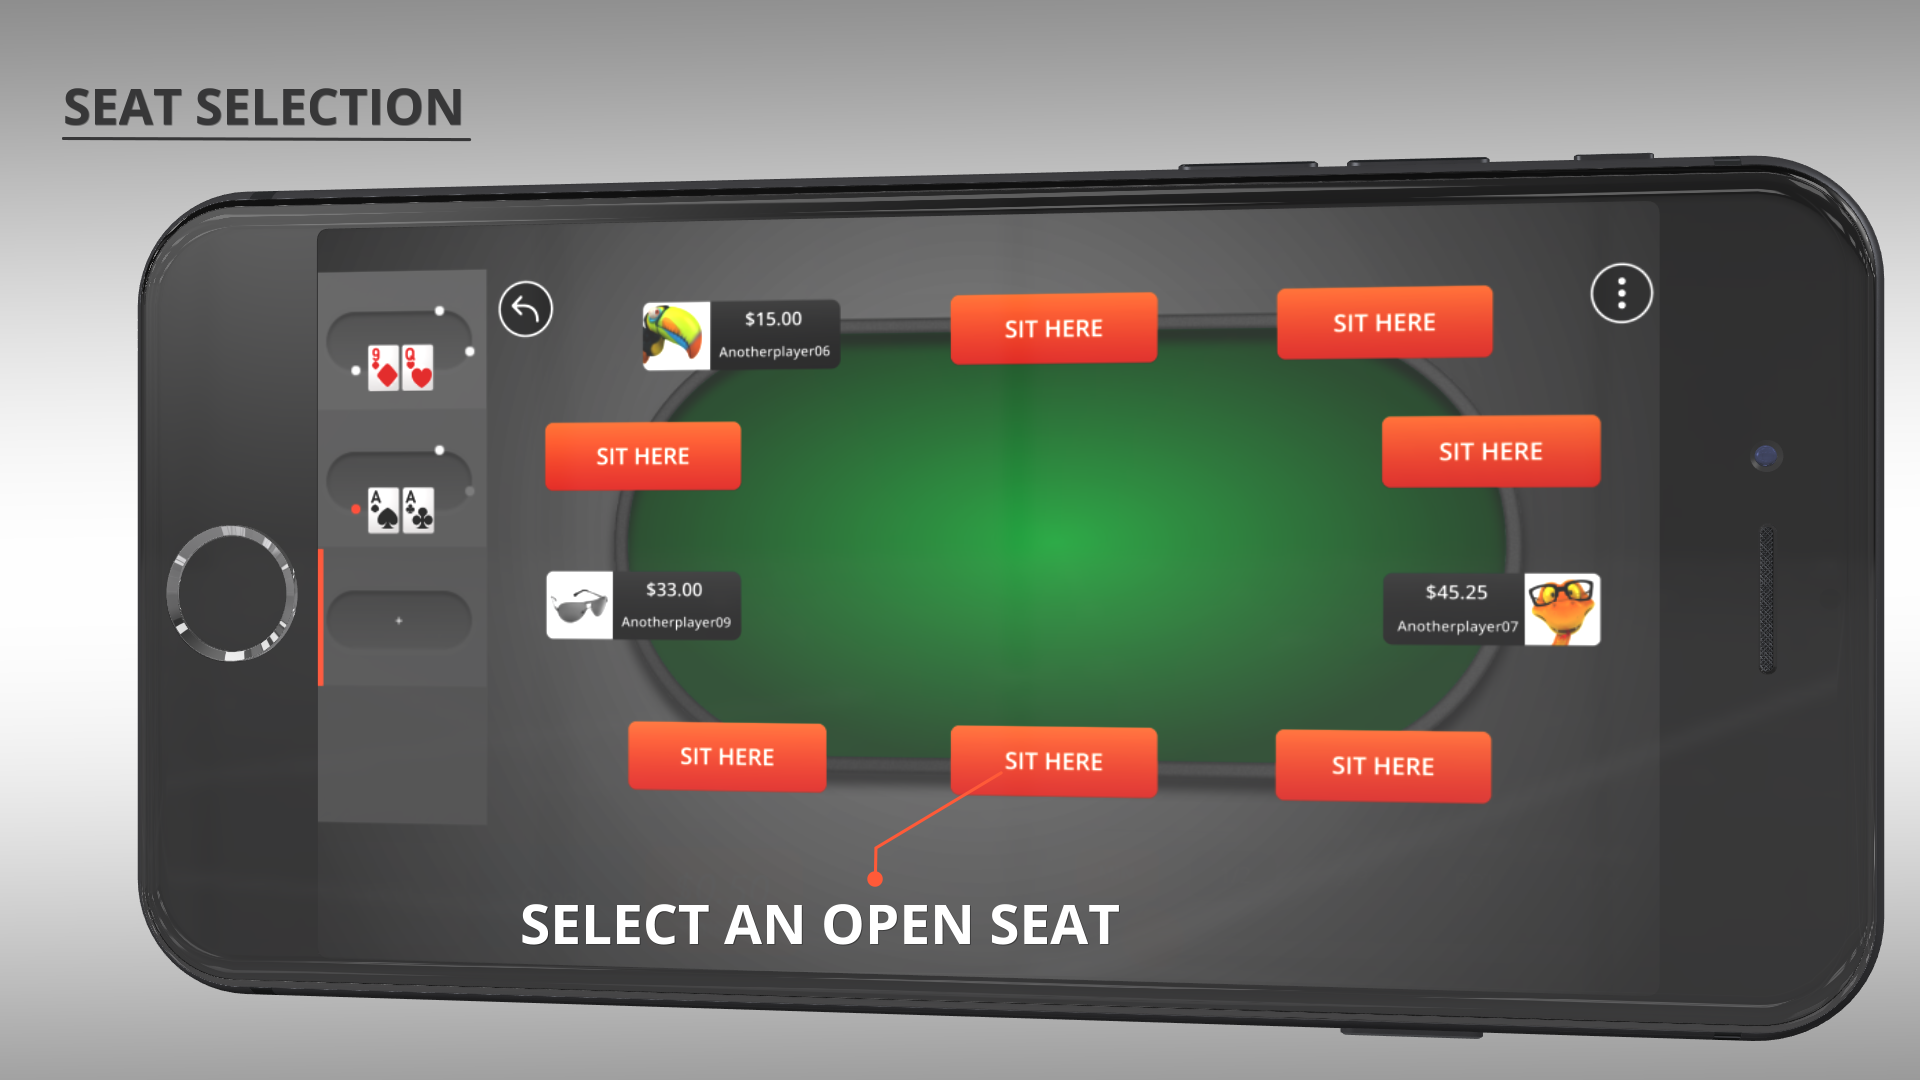 seat-selection-en_US.png